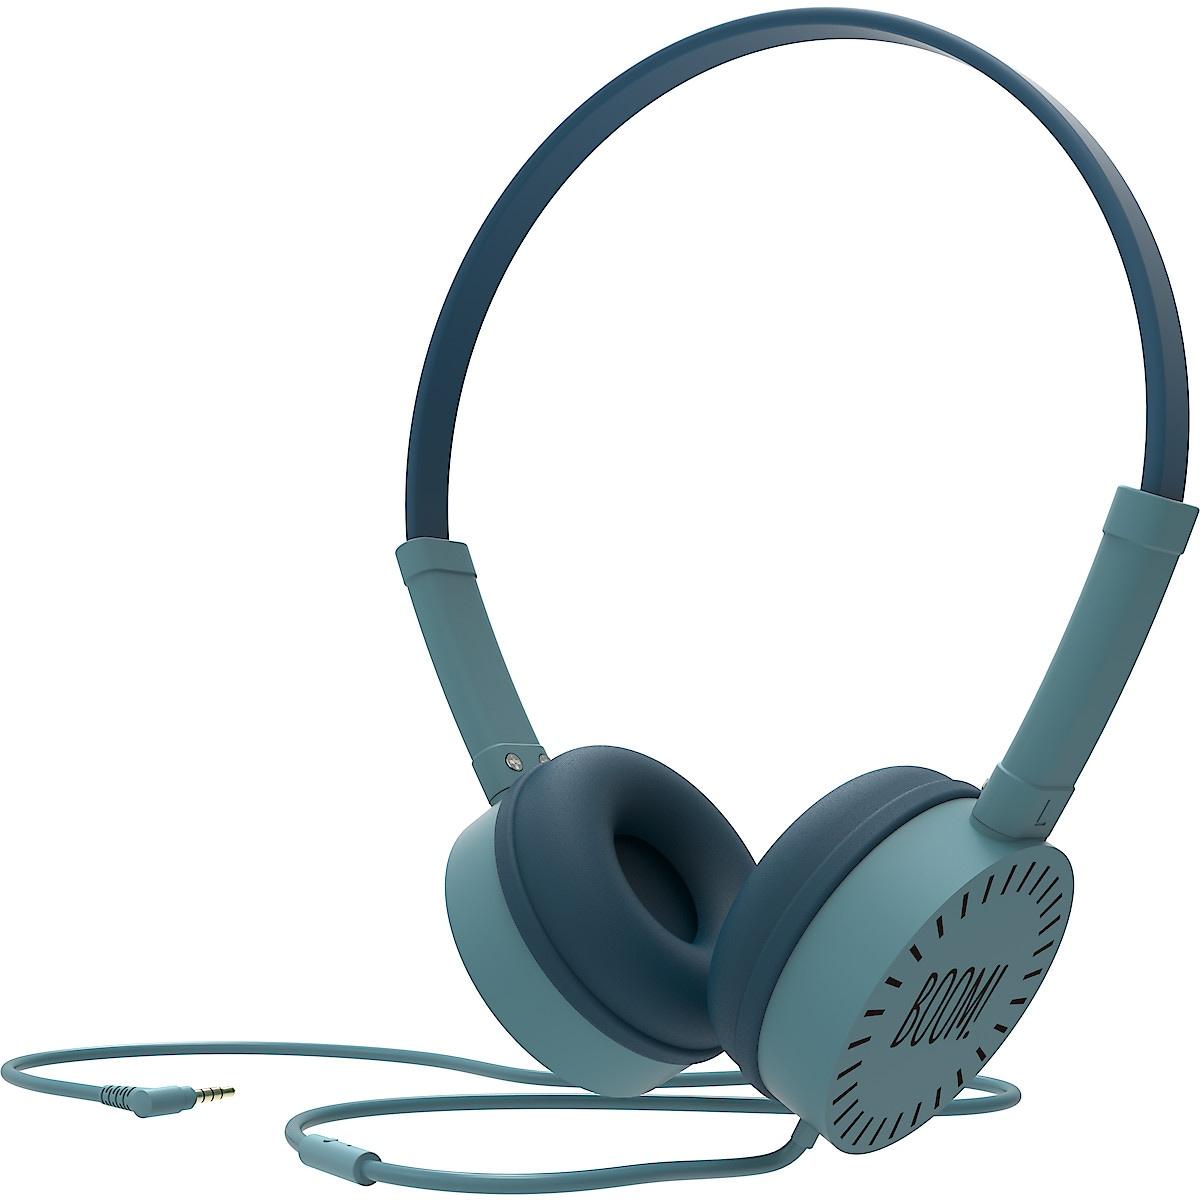 Kopfhörer für Kinder, Exibel